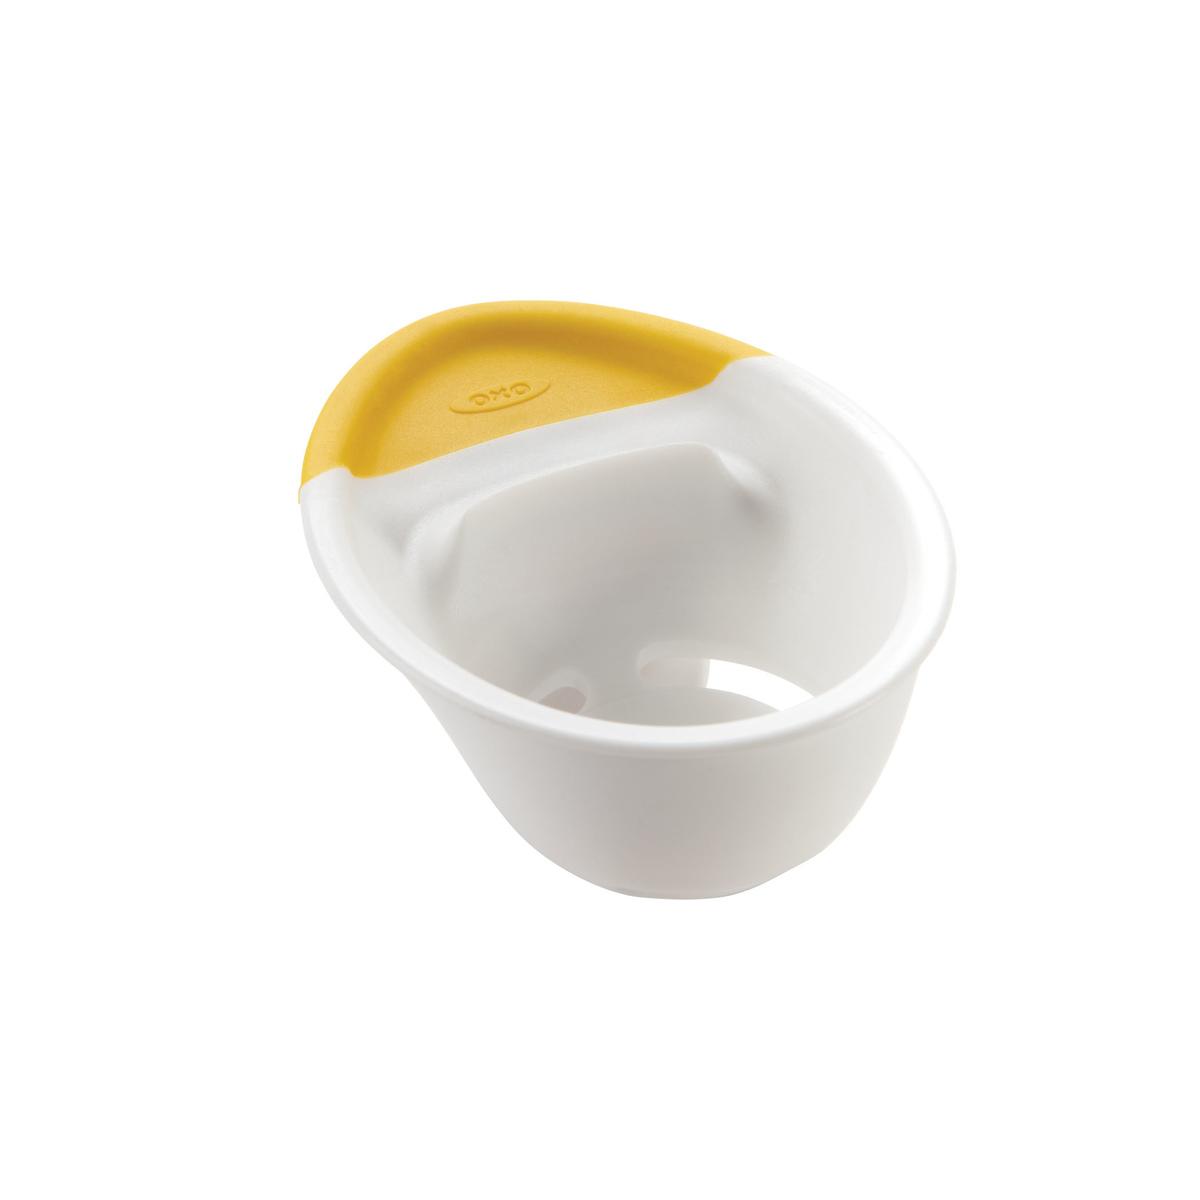 Онлайн каталог PROMENU: Сепаратор для яиц OXO COOKING UTENSILS, 4х12х22 см, белый                                   1147780